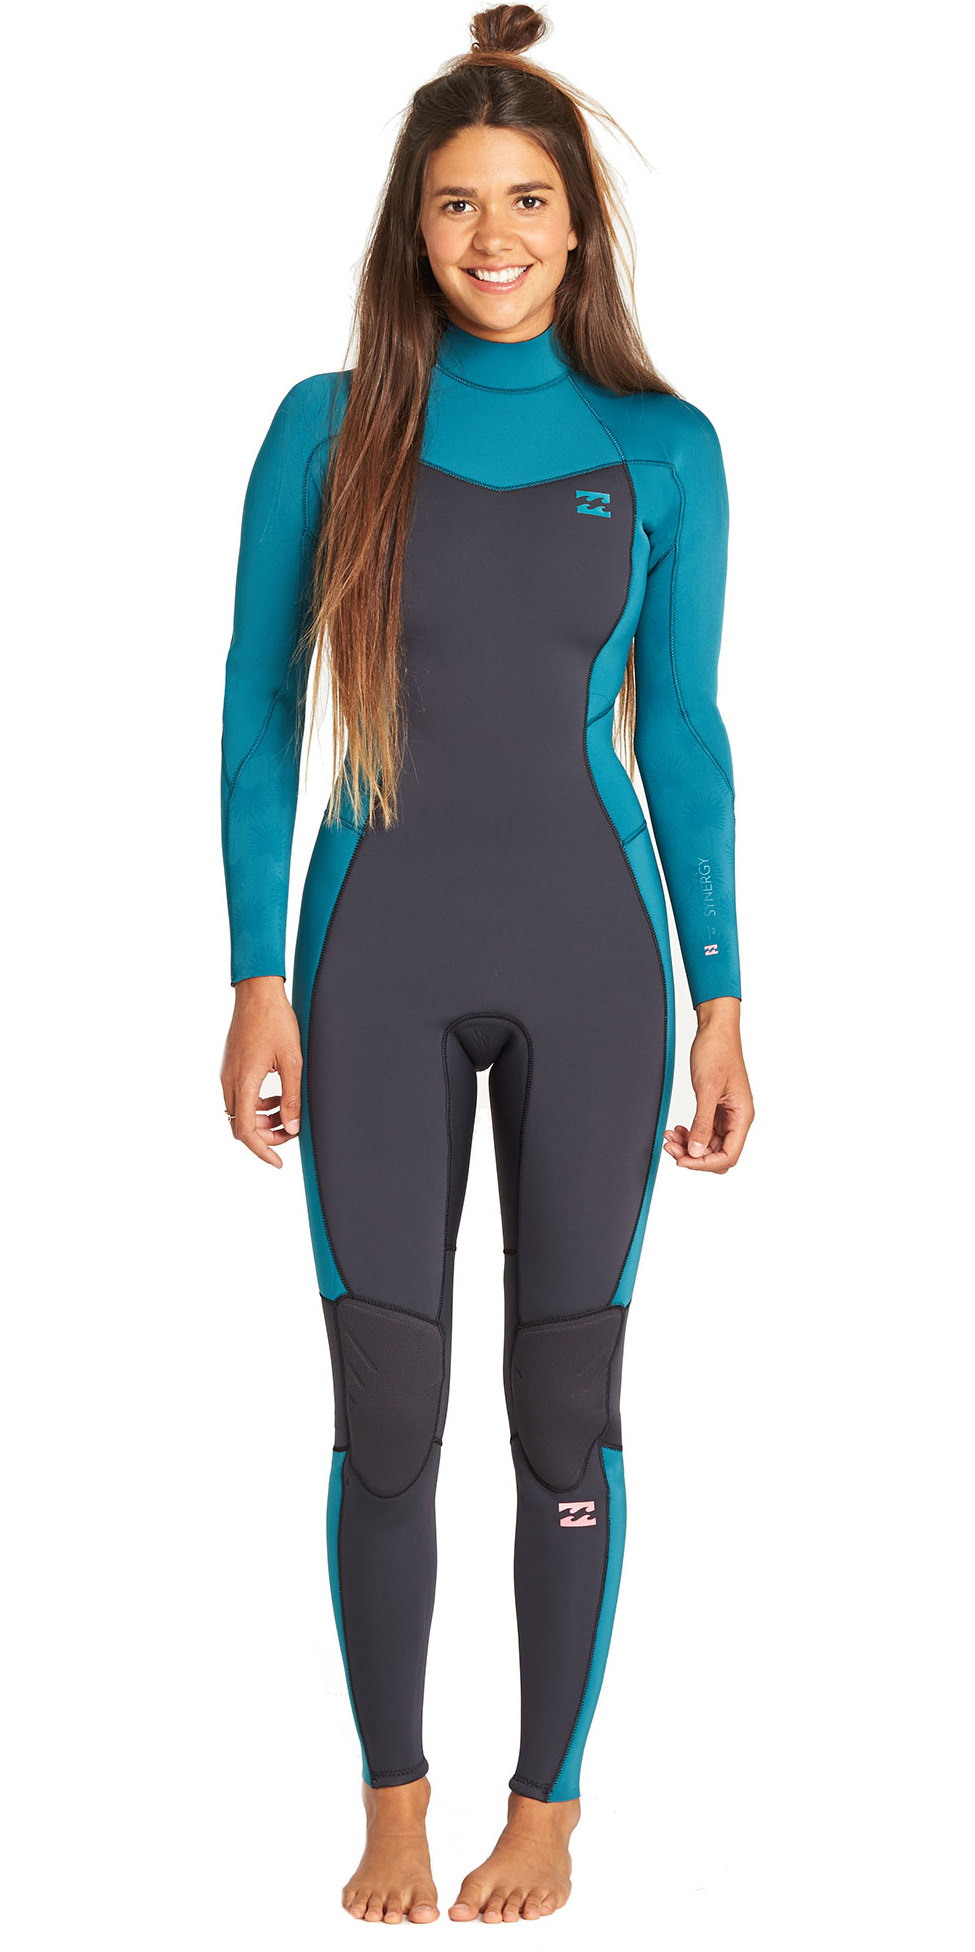 2019 Billabong Junior Girls Furnace Synergy 3/2mm Back Zip Flatlock Wetsuit Pacific N43B08